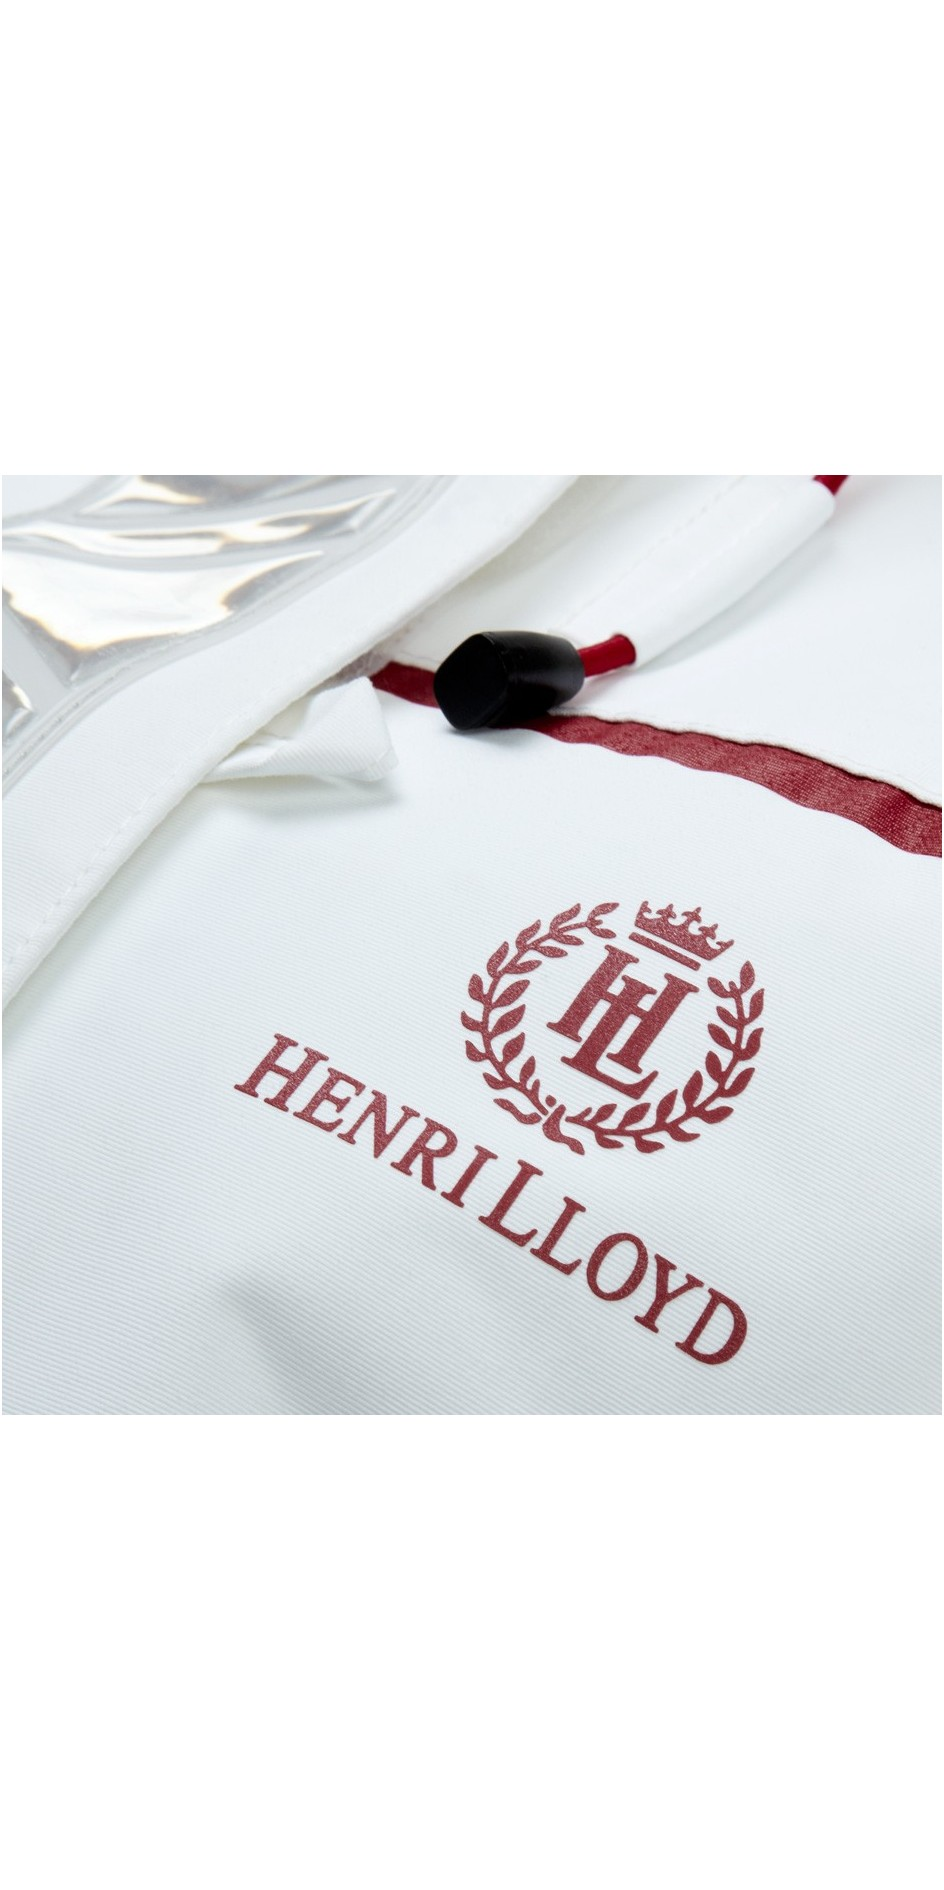 Henri Lloyd Ladies Freedom Offshore Jacket Optic White Y00352